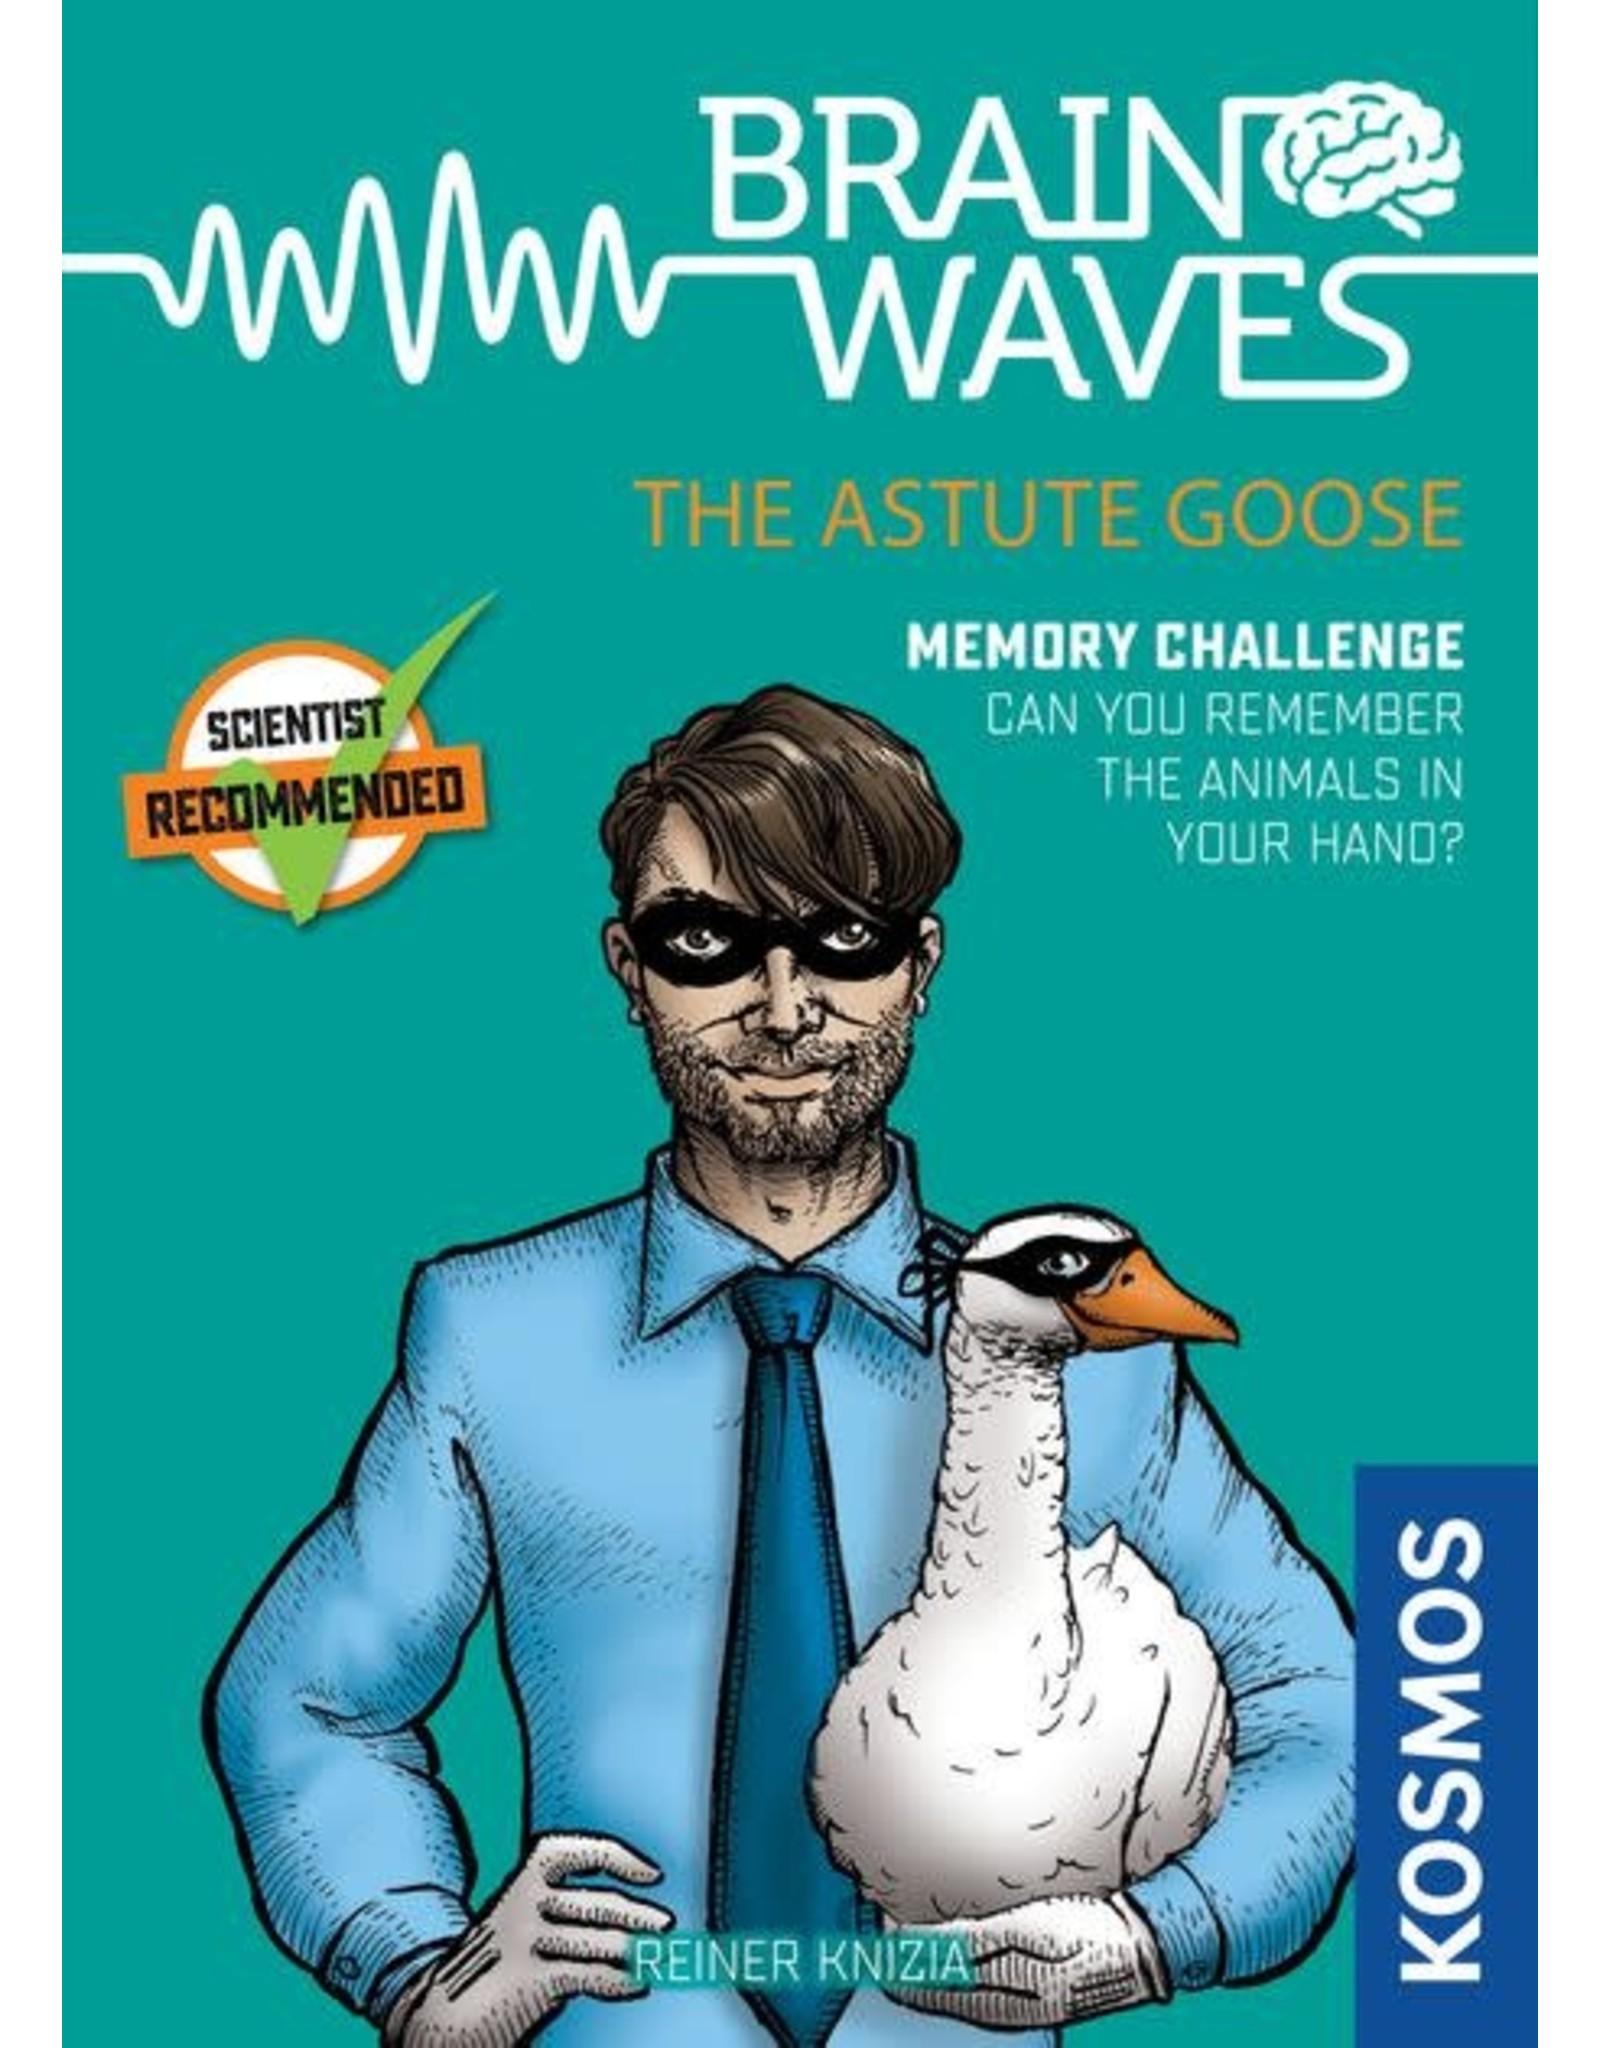 Brain Waves The Astute Goose